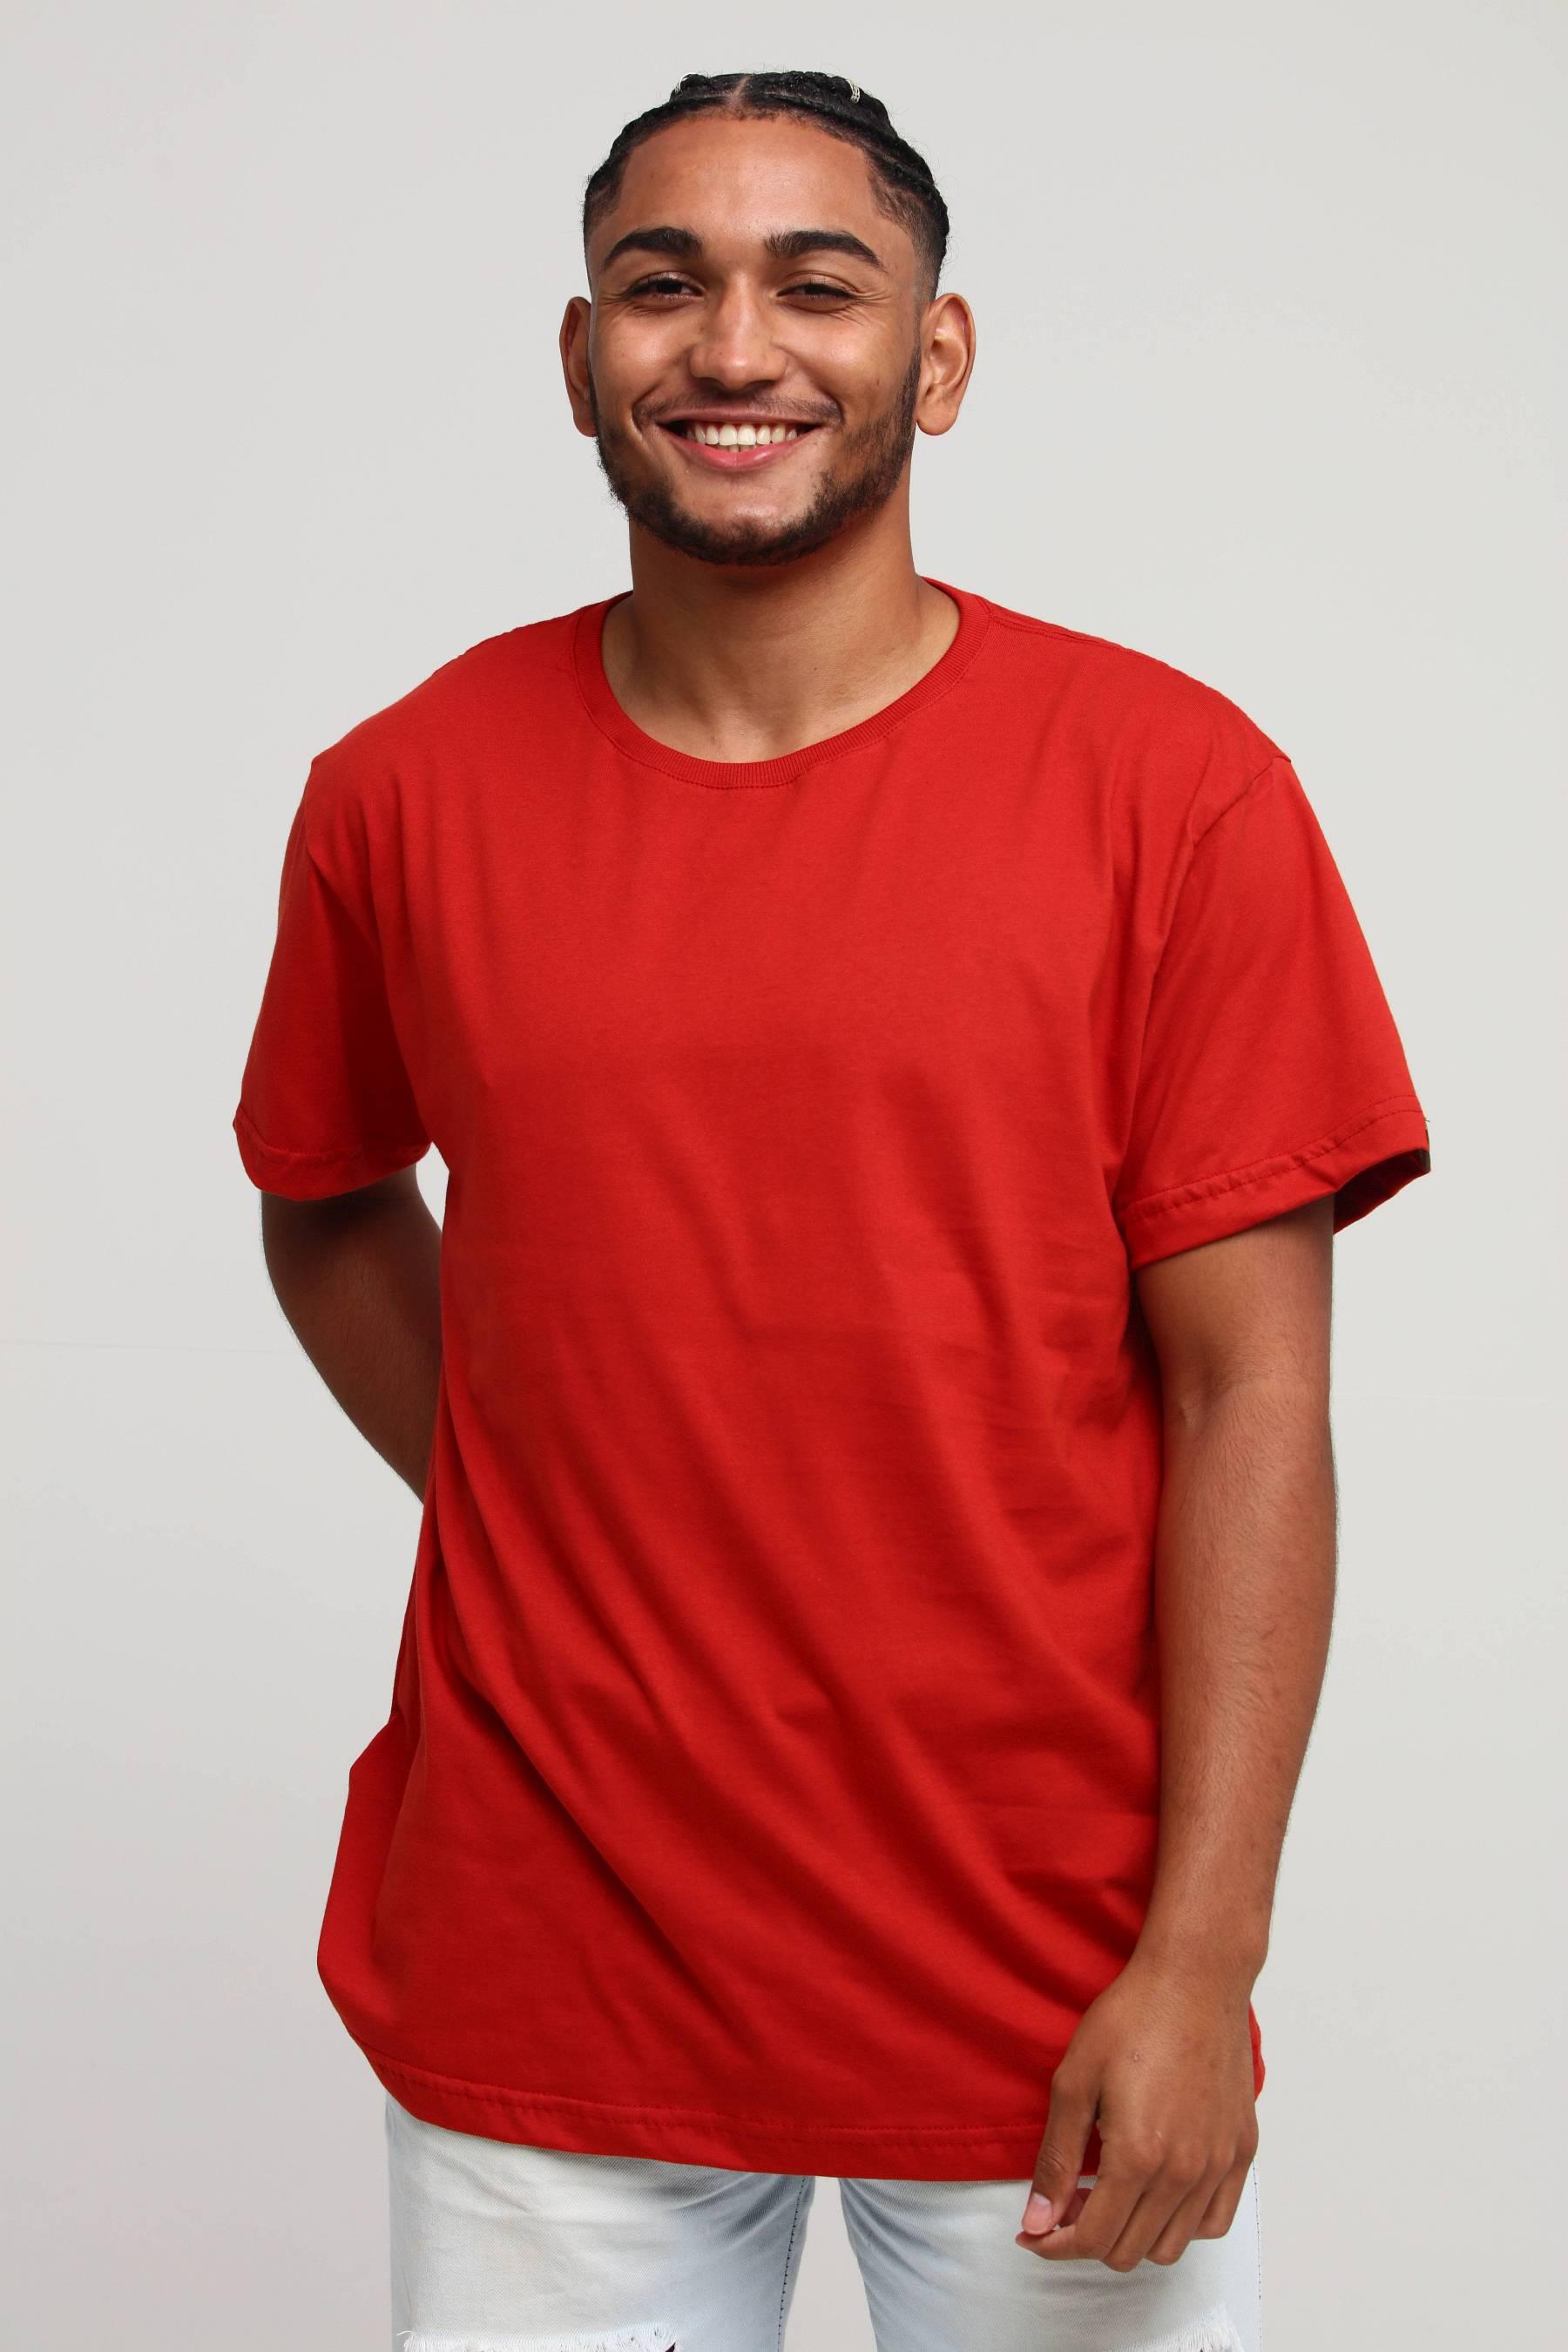 Camiseta Básica Vermelho Framboesa